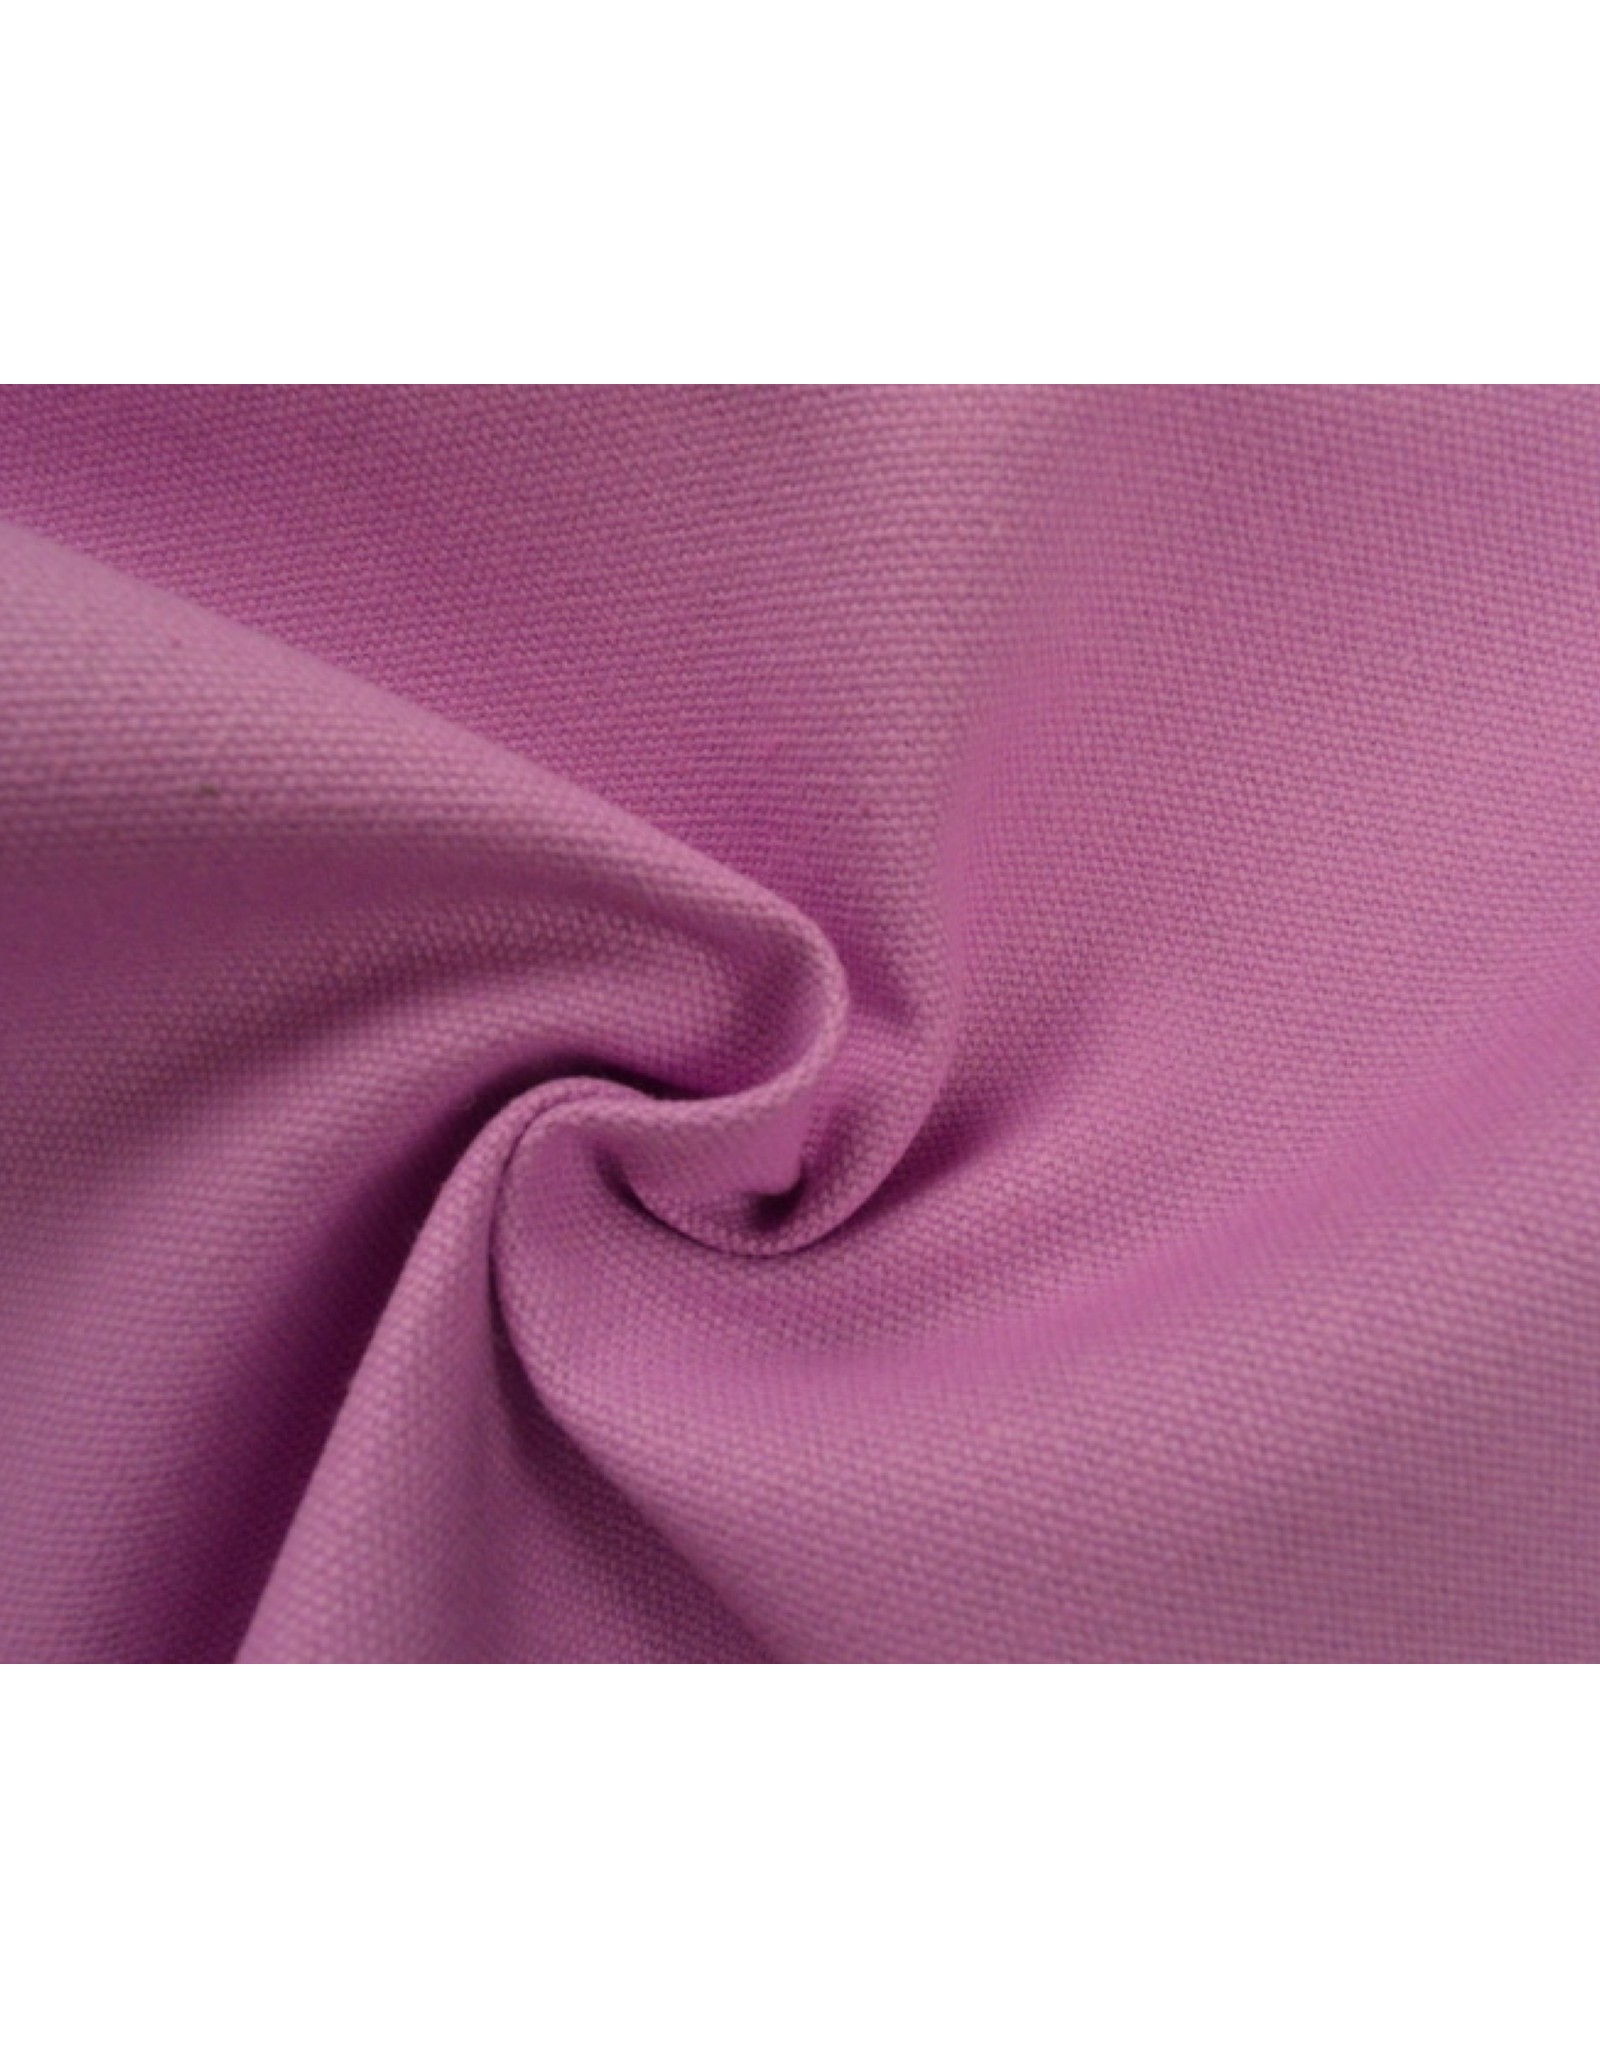 Kanvas stoff Uni - Rosa  (350 gr/m)